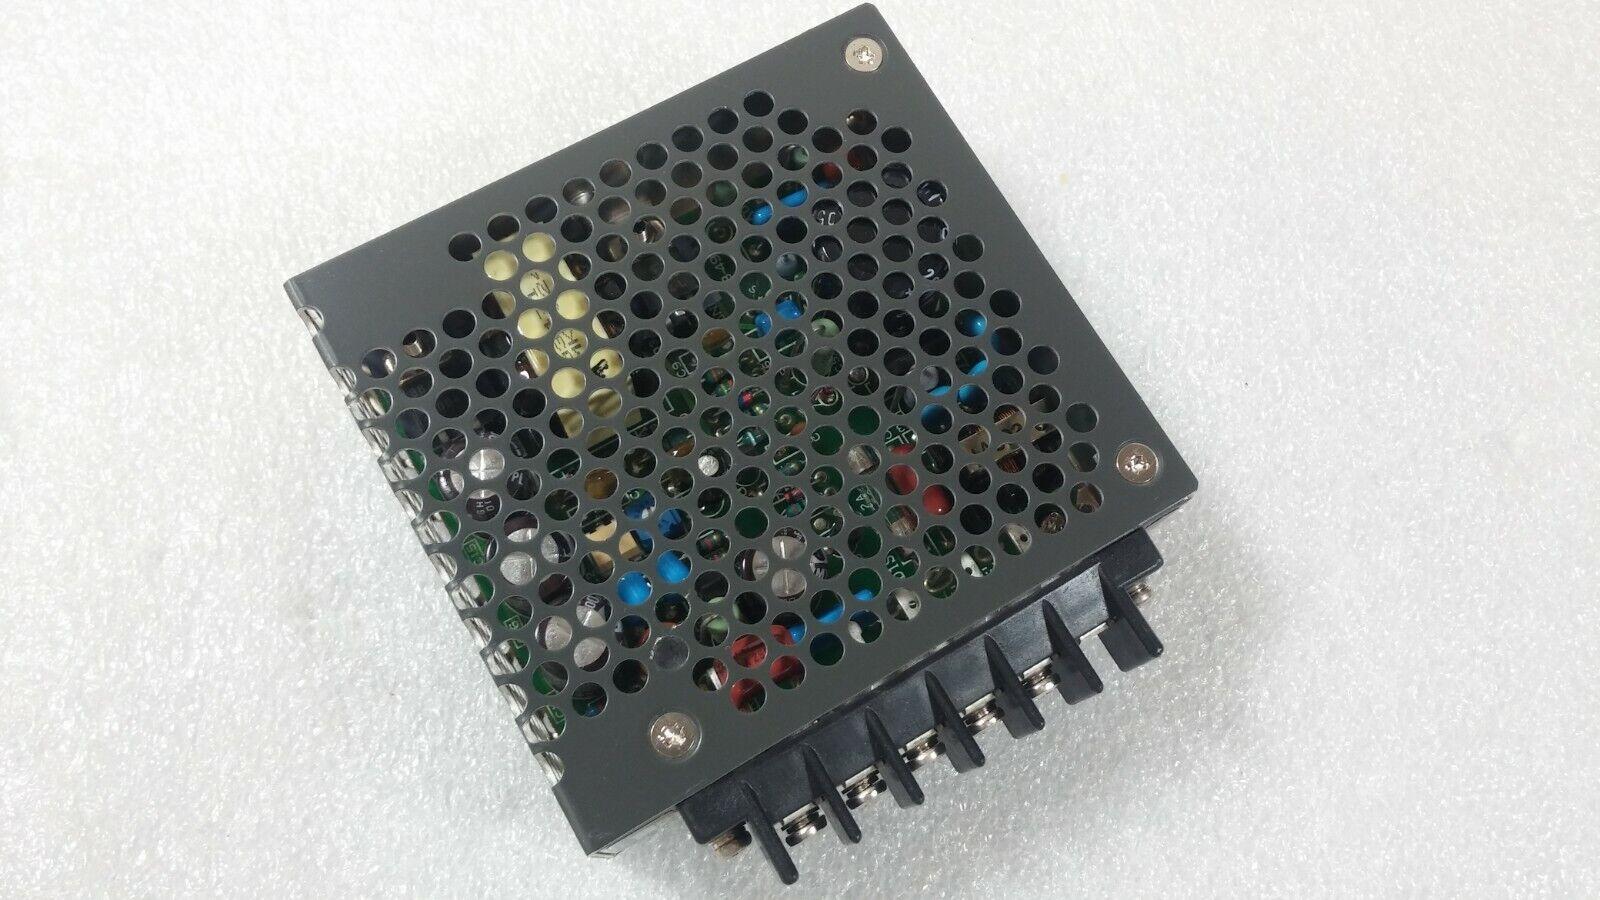 Nemic Lambda ES-8-5 DC 3.0A Power Supply - $35.00